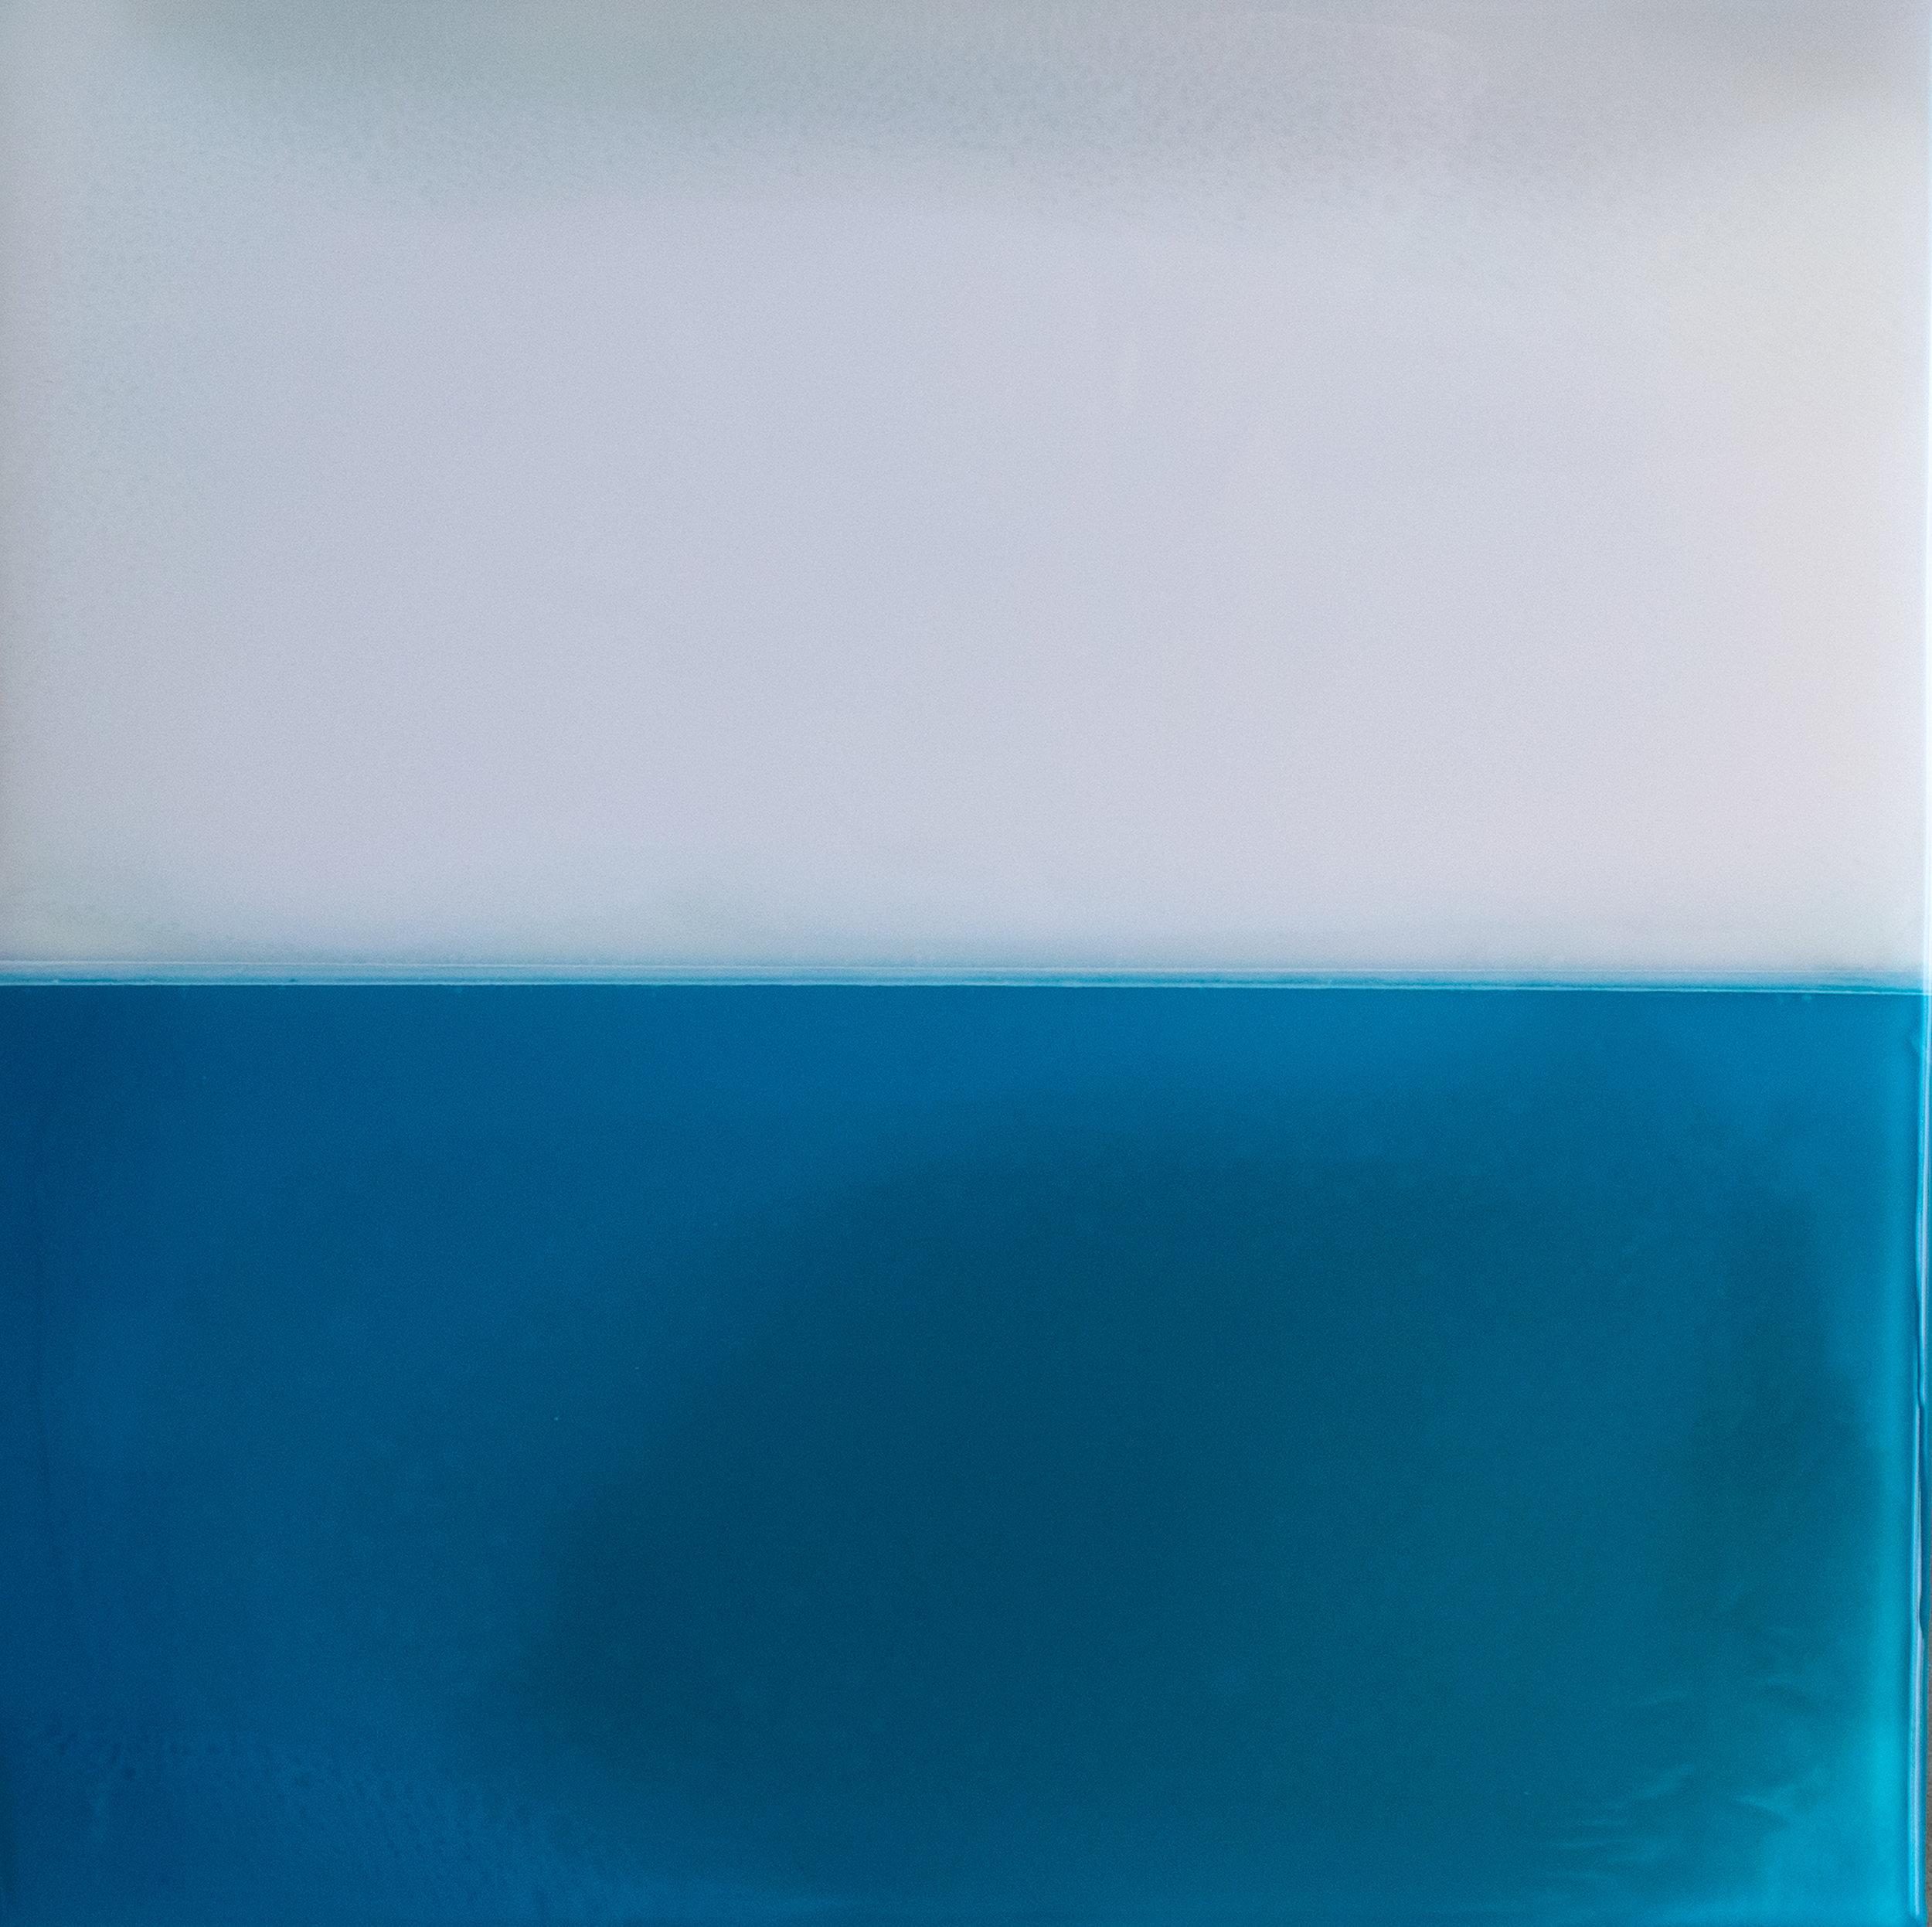 "Horizon Study No. 7 - 12"" x 12"" tinted resin on panelSOLD"